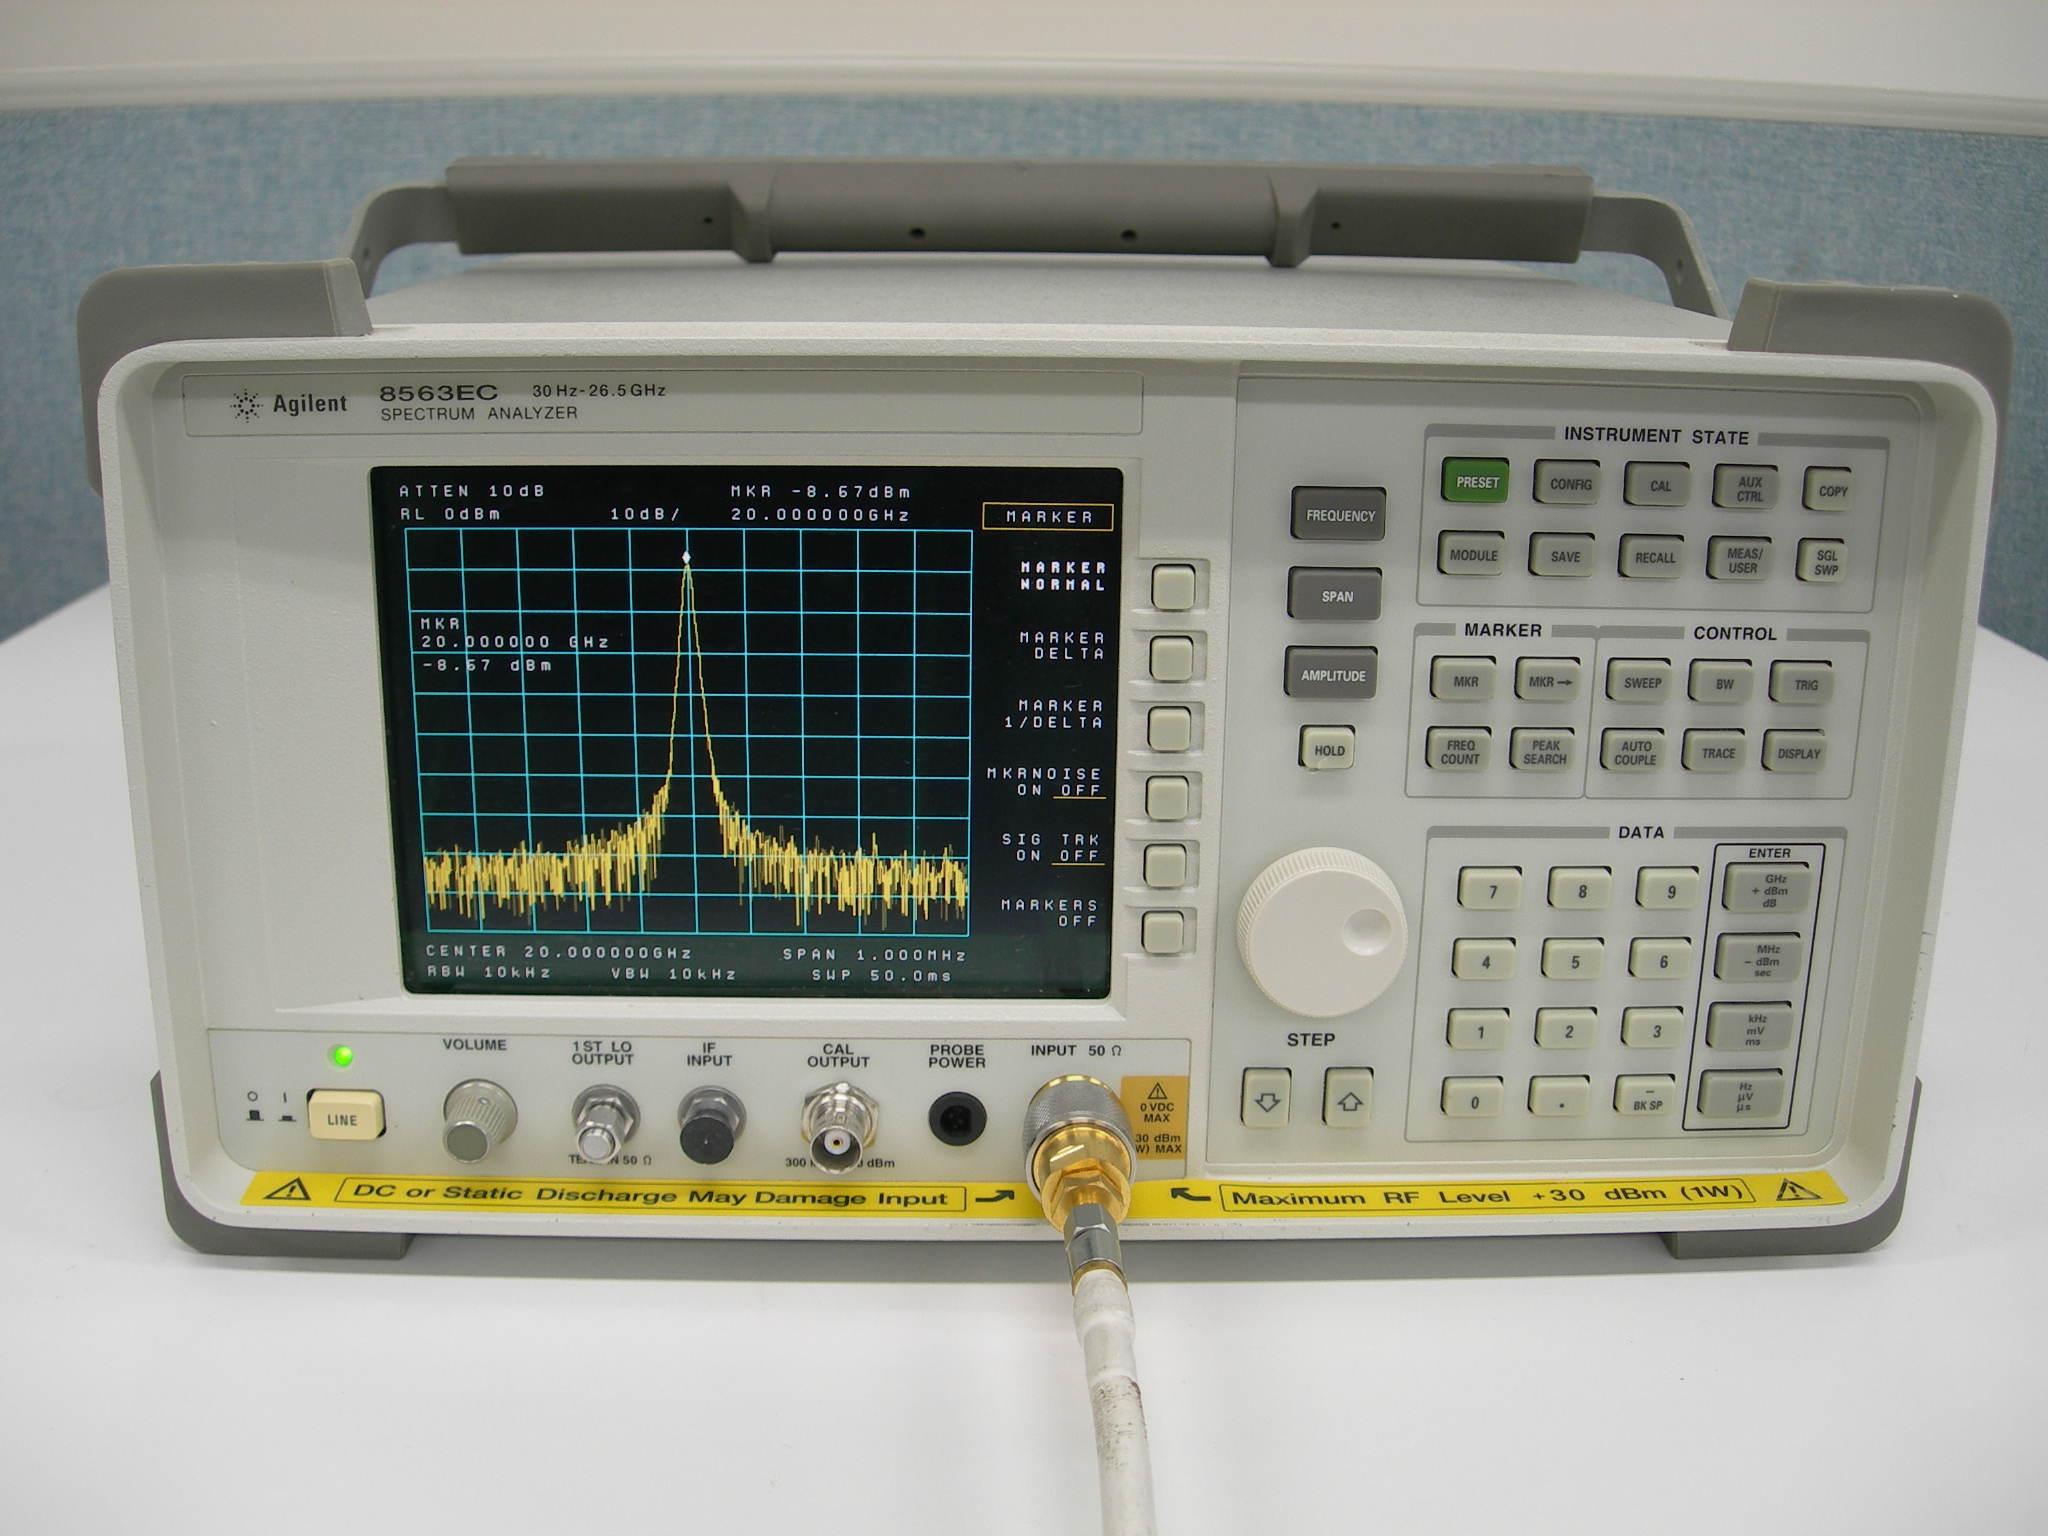 Agilent 8563EC 9kHz-26.5GHz 可攜式頻譜分析儀